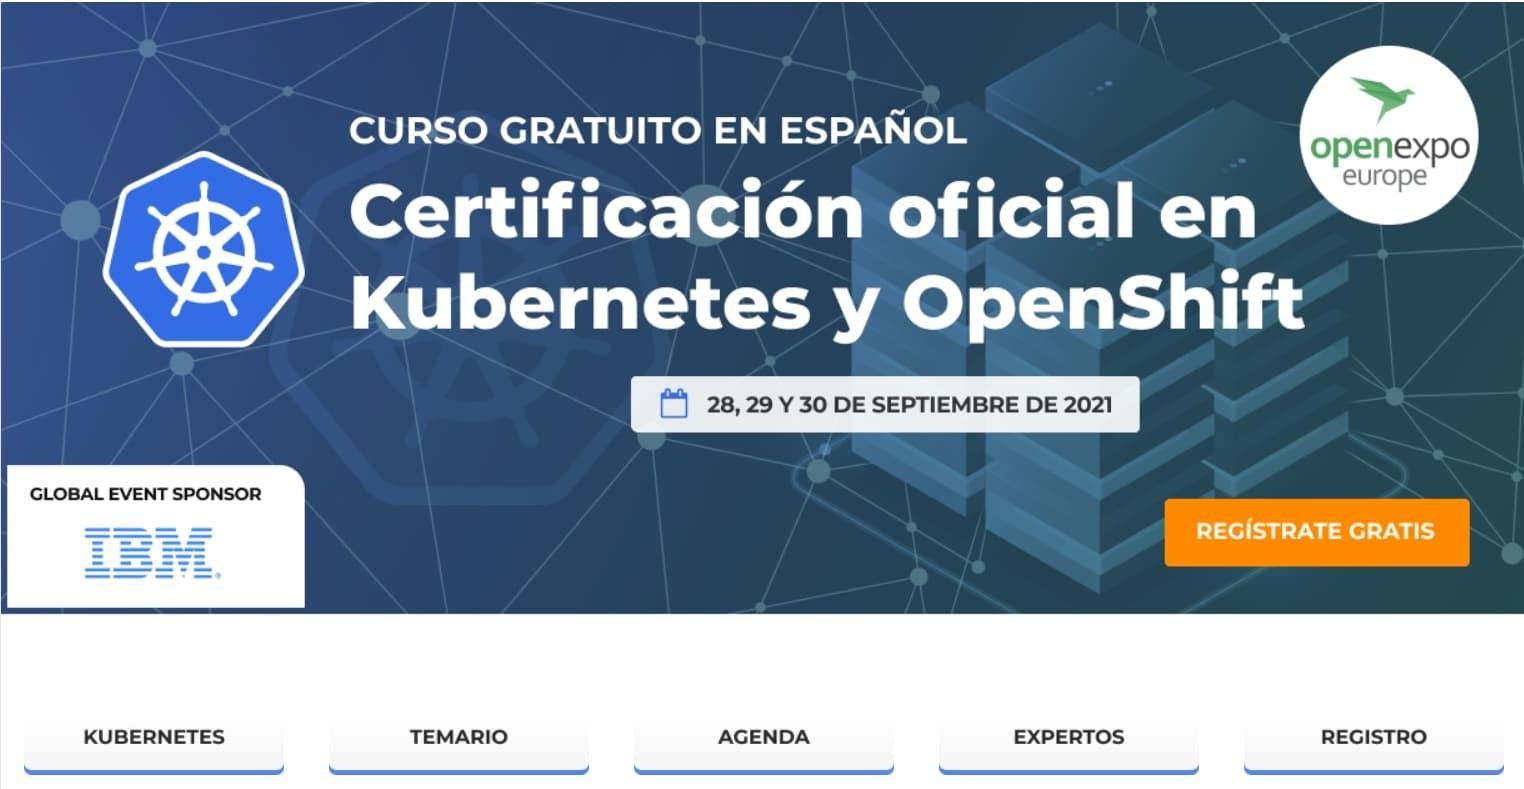 Kubernetes Openshift Curso gratis OpenExpo Europe